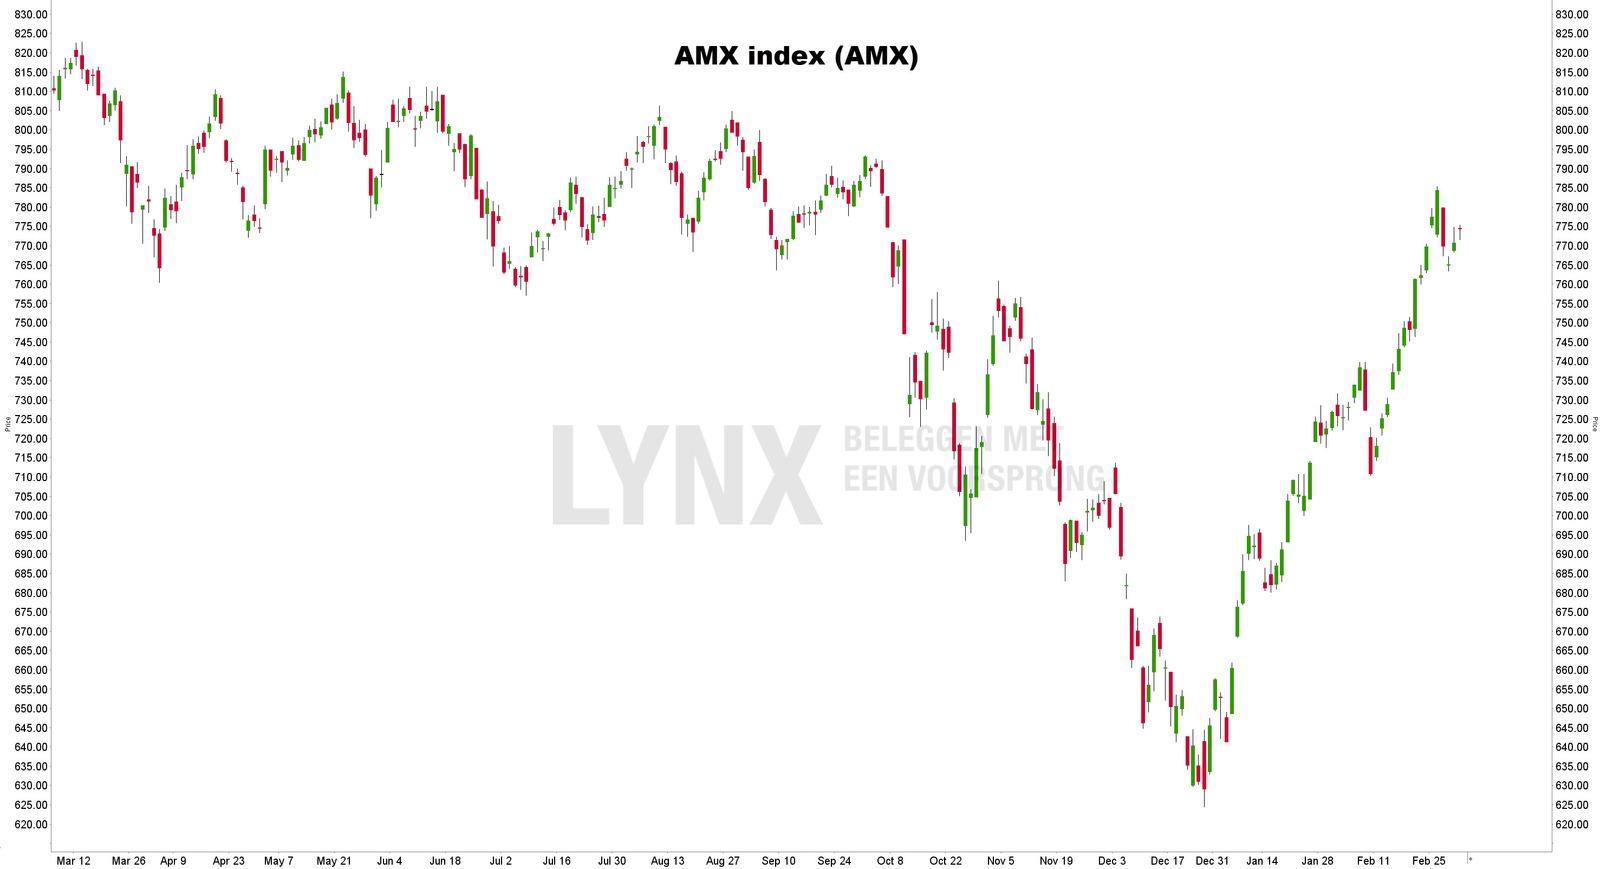 Grafiek AMX index